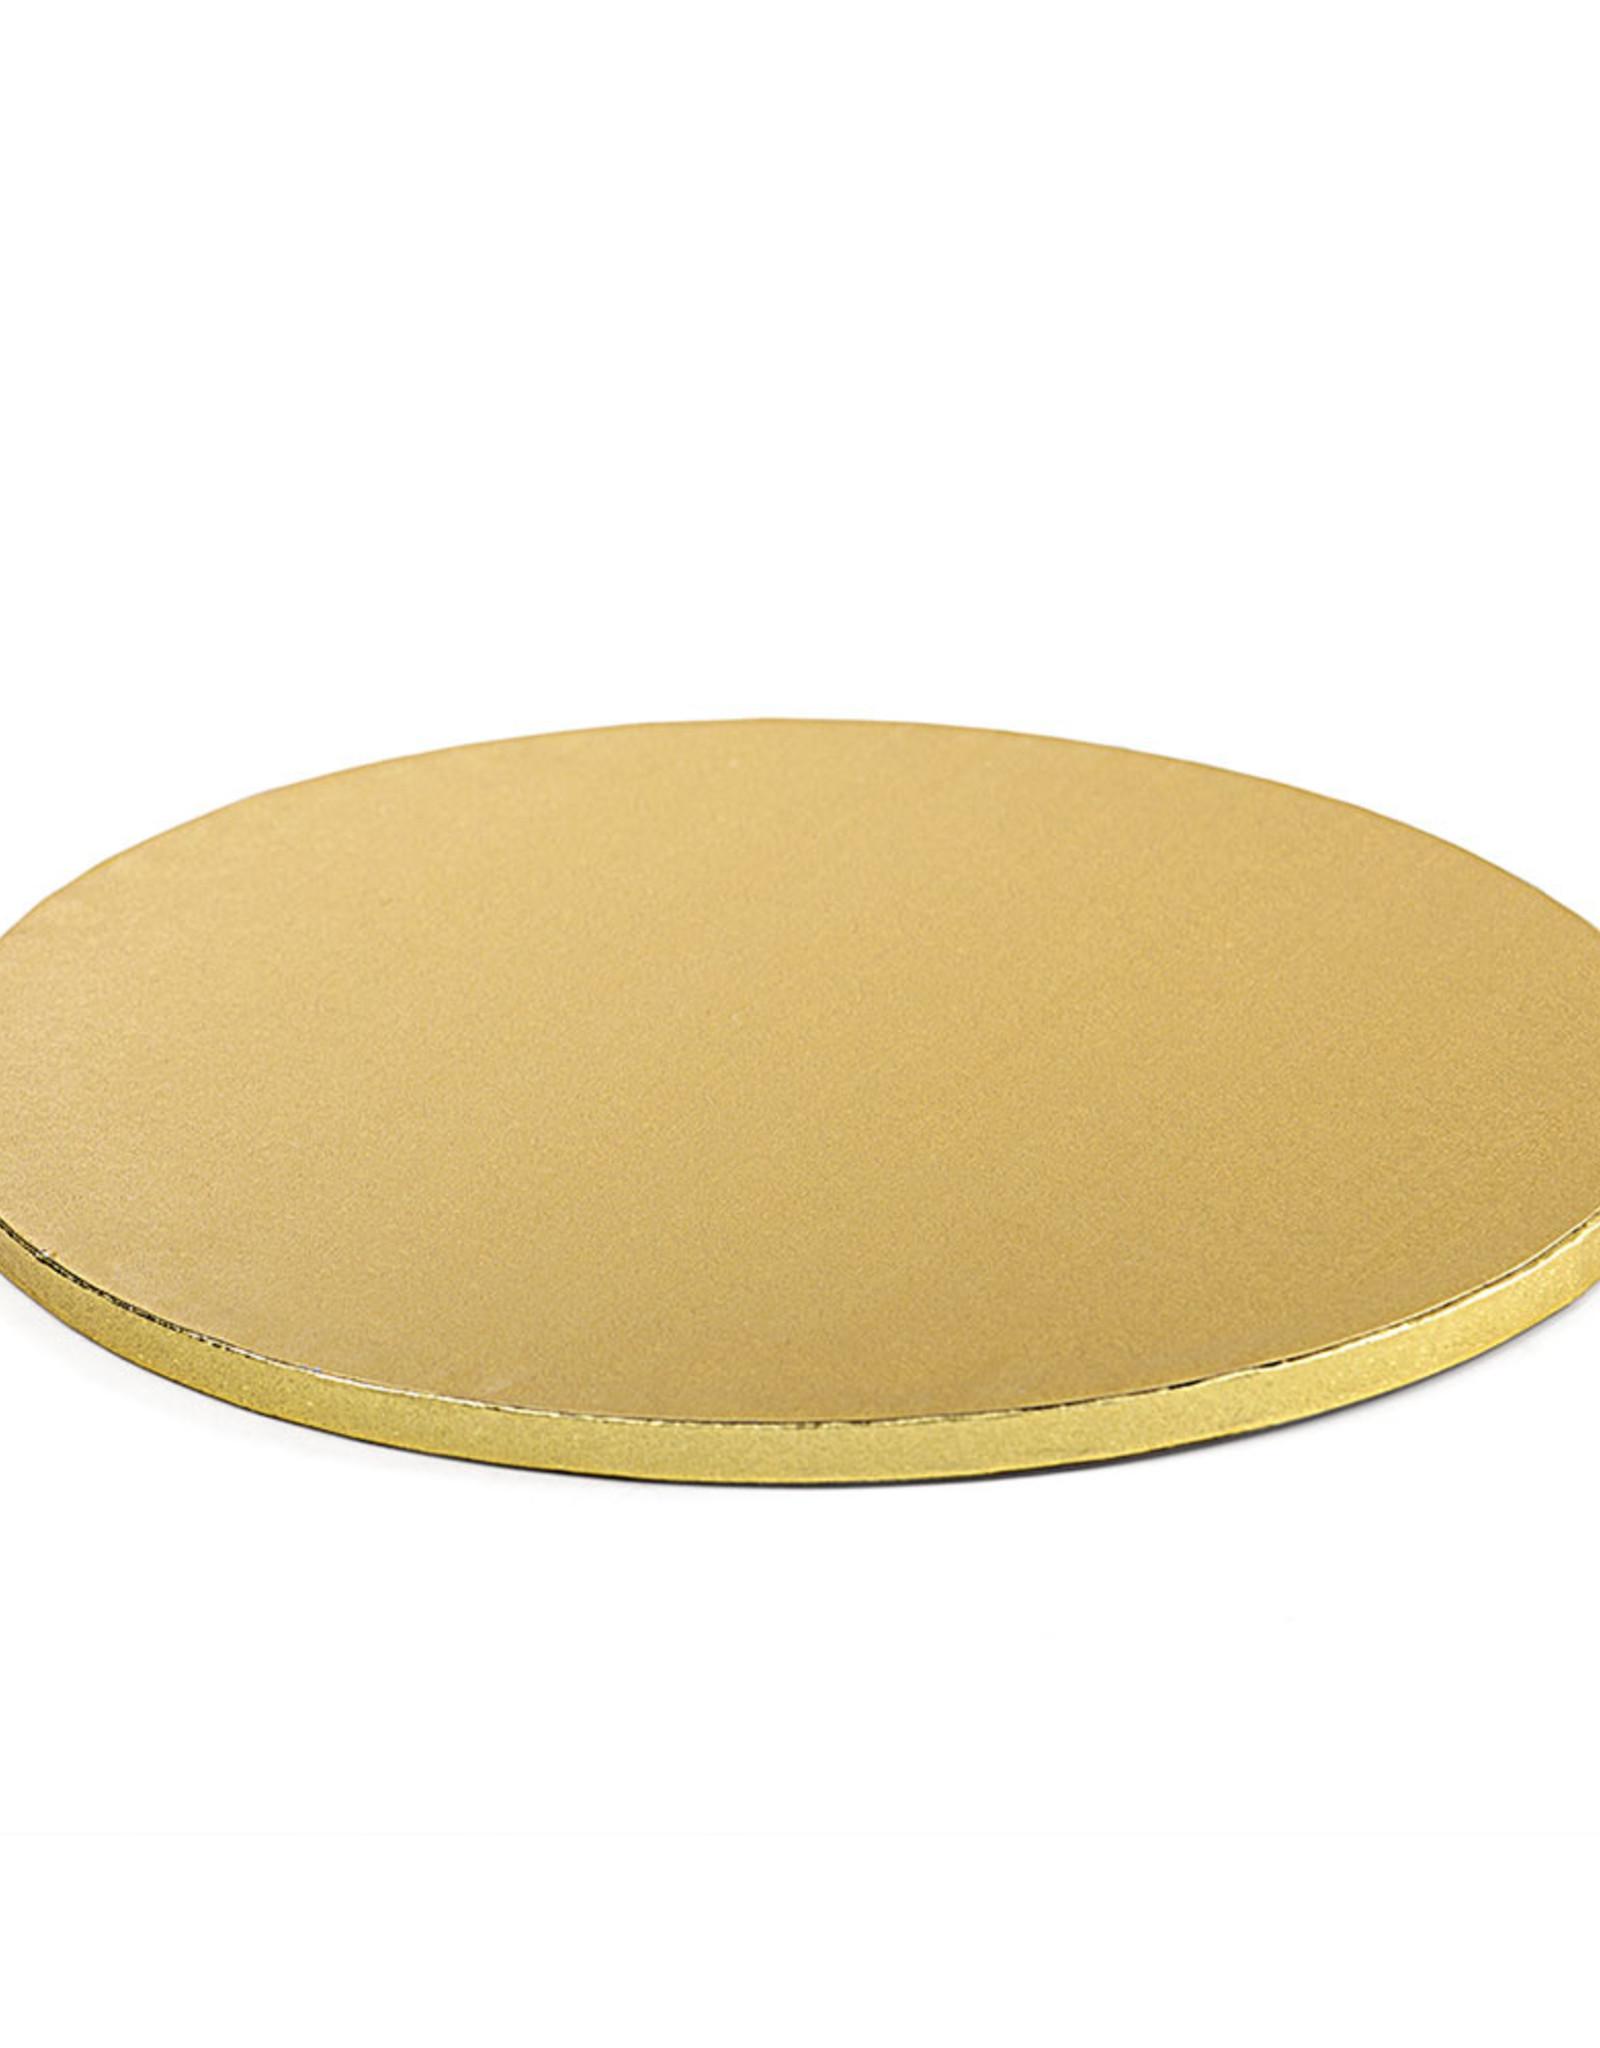 Decora Cake Drum Rond Ø45cm Gold